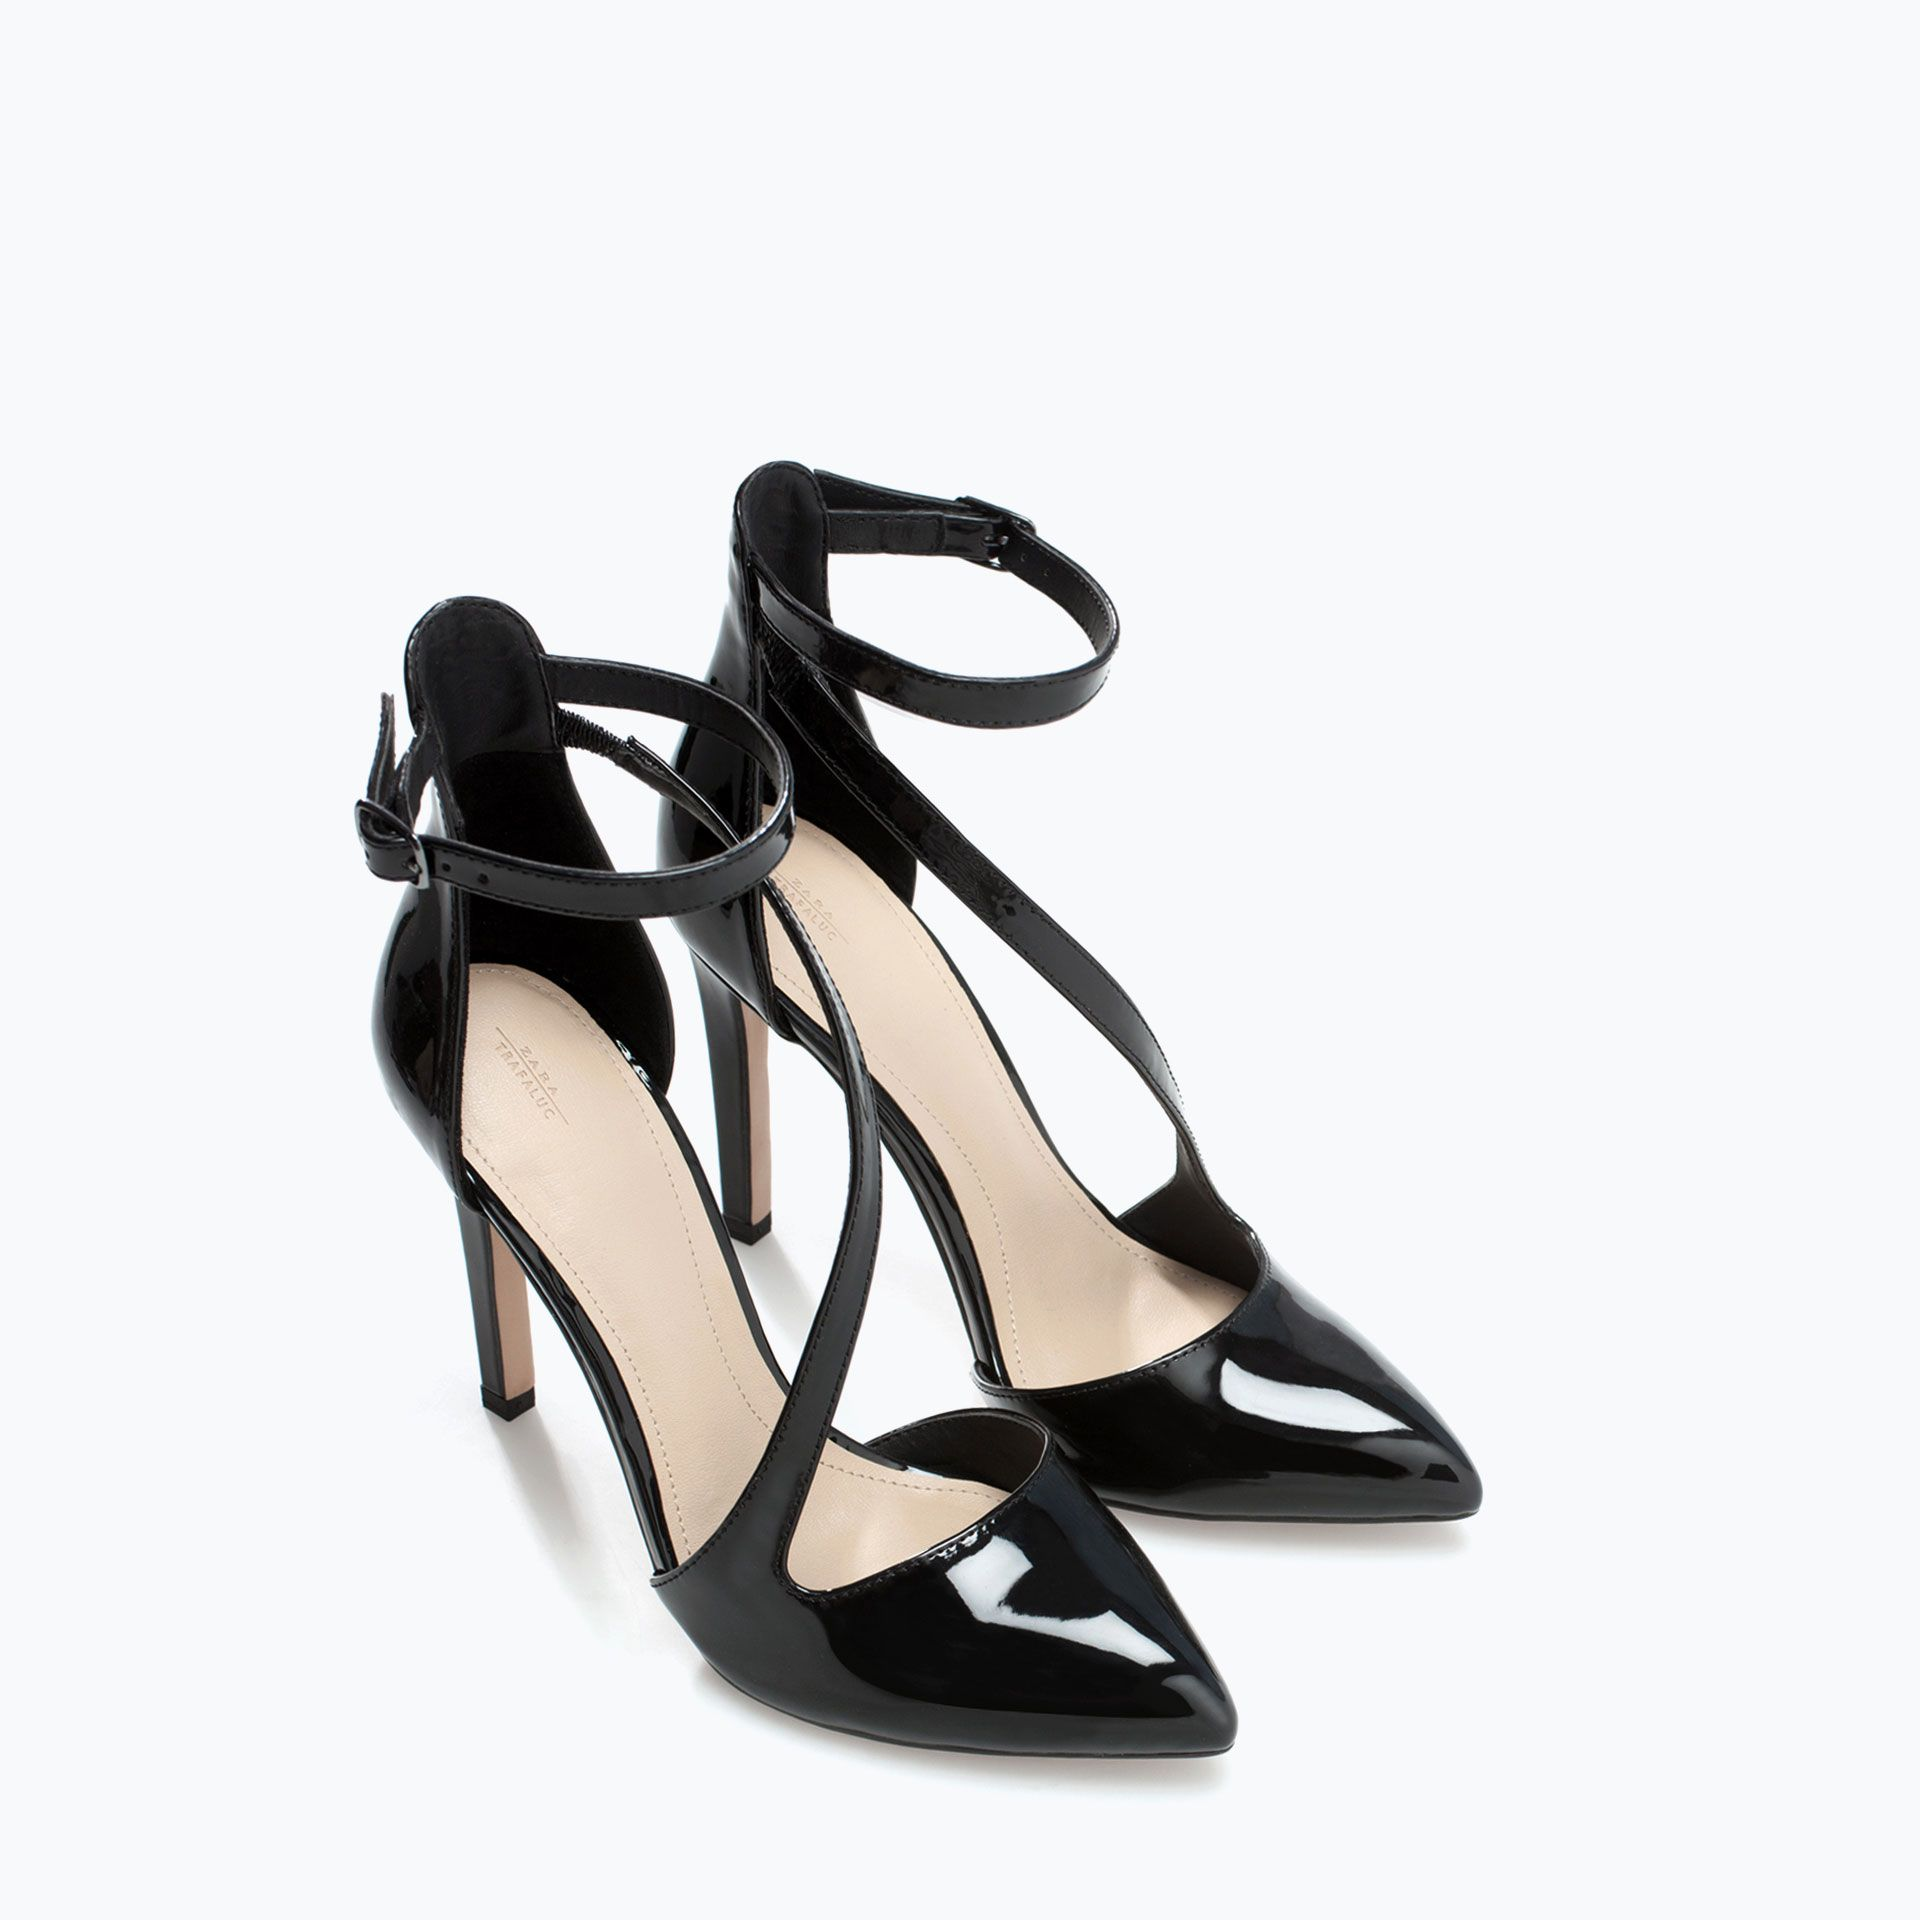 With Bags Strap Style My Asymmetric Shoe Zapatos Zara Court pI15q